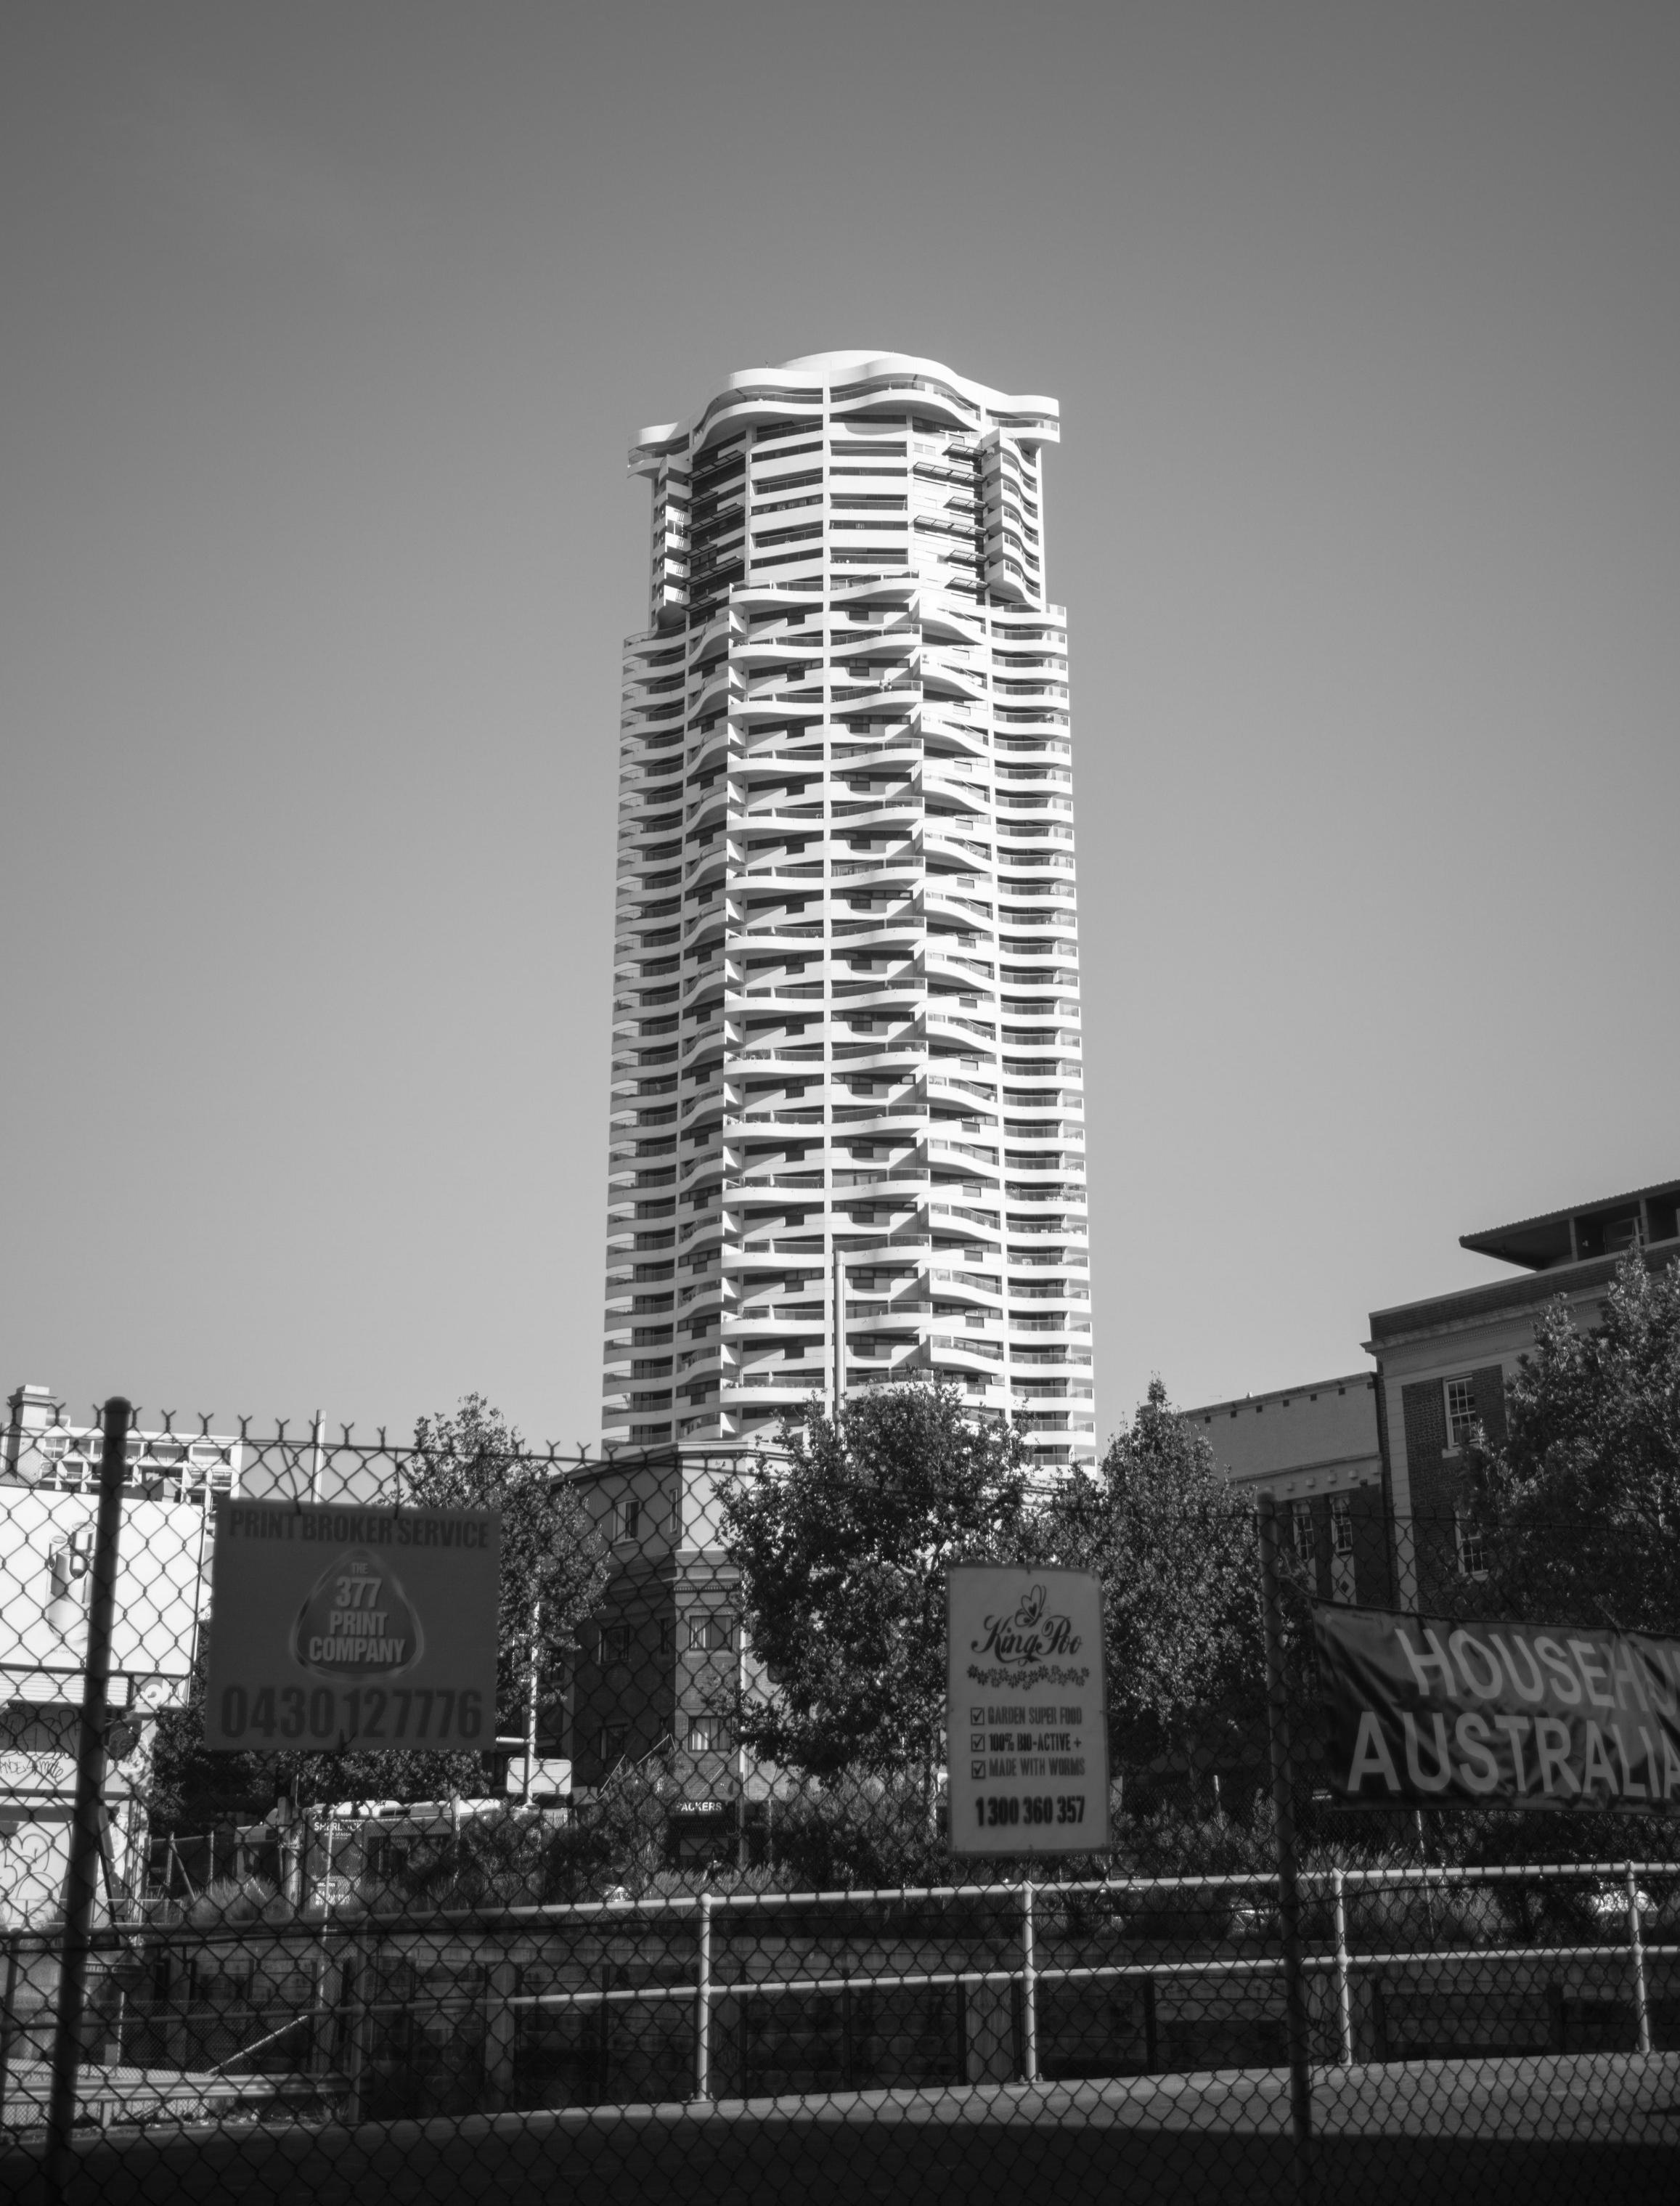 Horizon Apartments in Darlinghurst, Sydney (1990-1998).